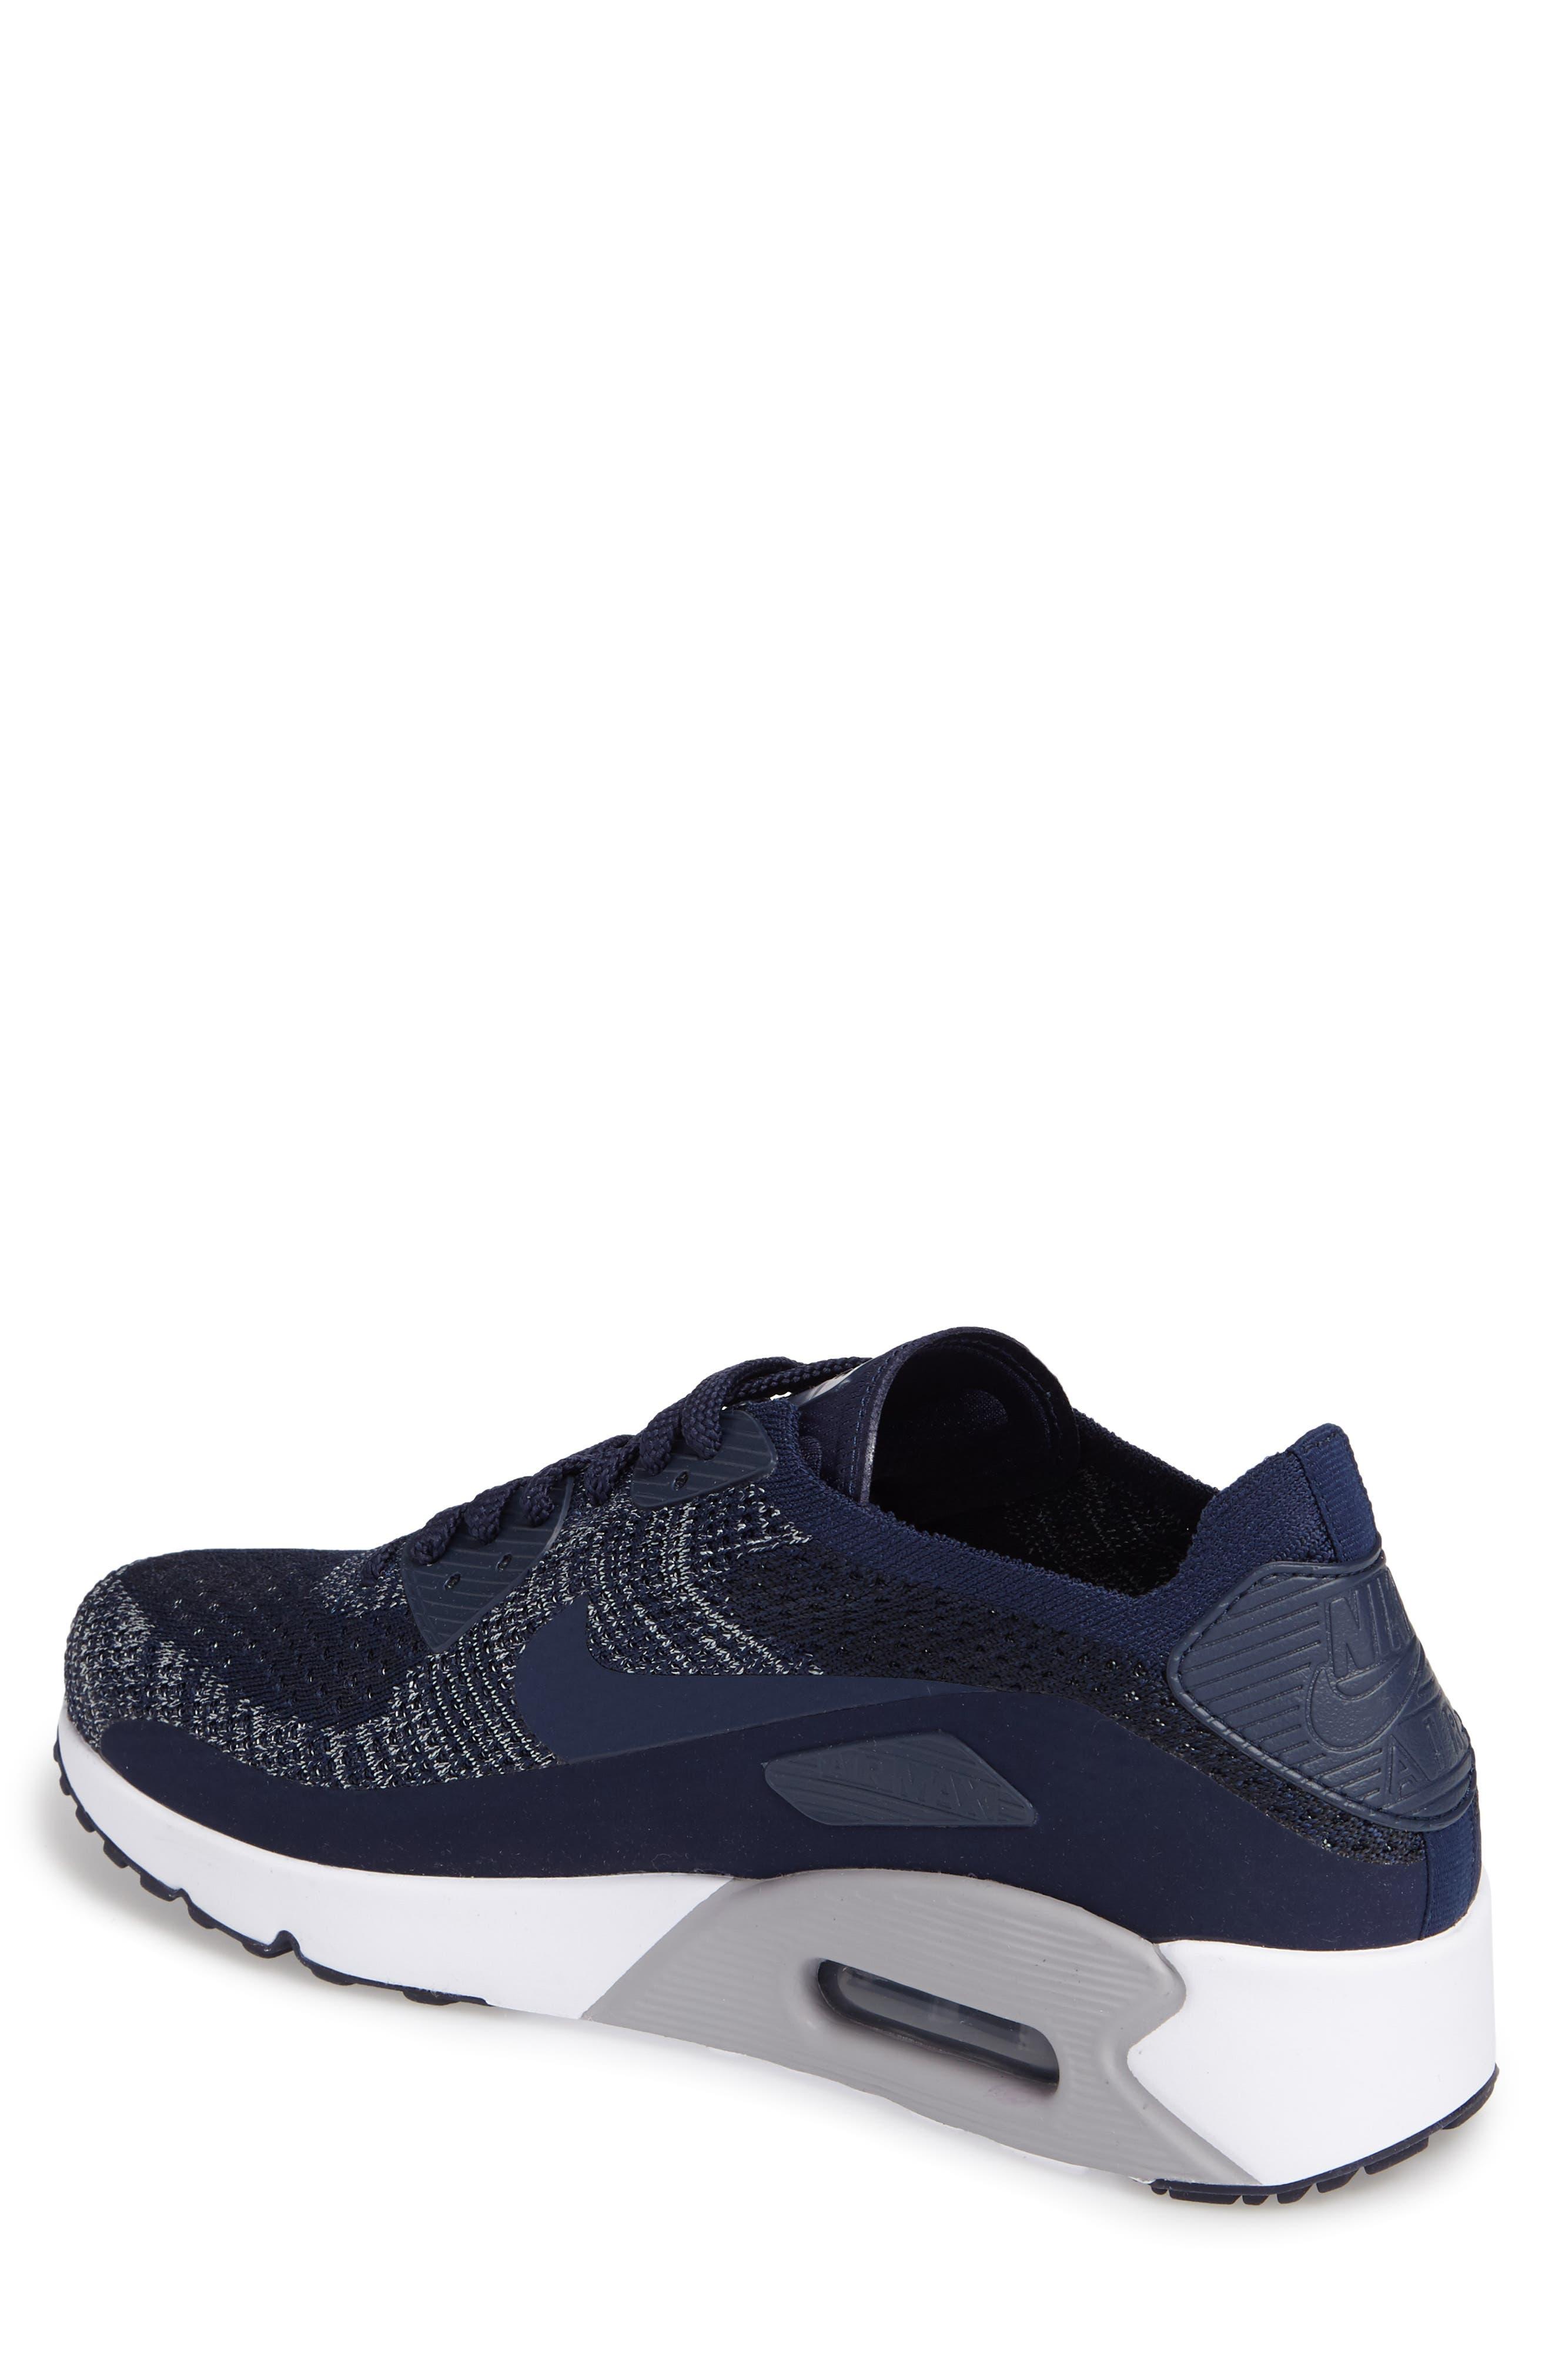 Air Max 90 Ultra 2.0 Flyknit Sneaker,                             Alternate thumbnail 2, color,                             Navy/ Navy/ Grey